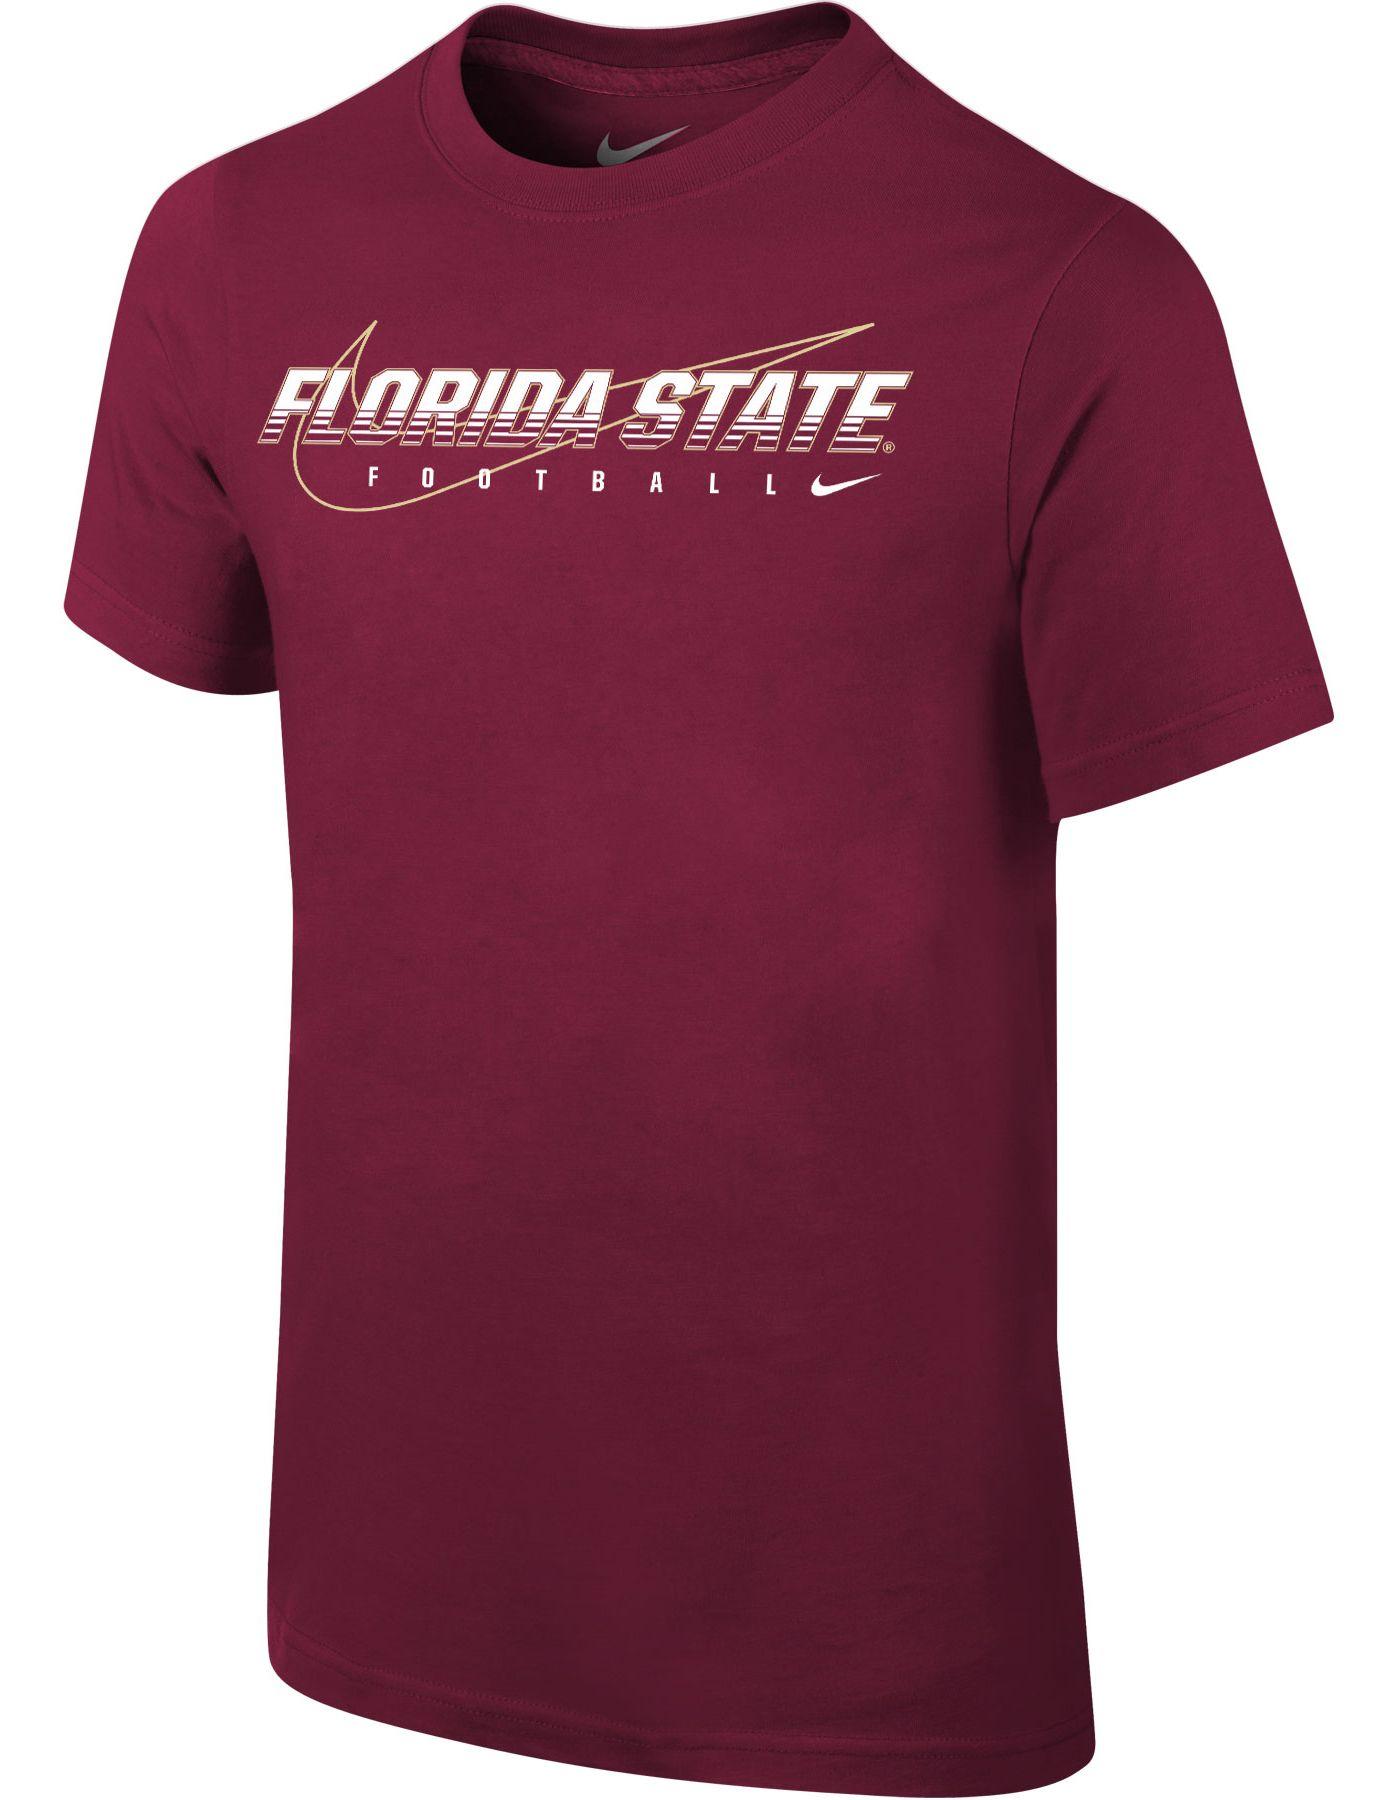 Nike Youth Florida State Seminoles Garnet Football Dri-FIT Cotton Facility T-Shirt